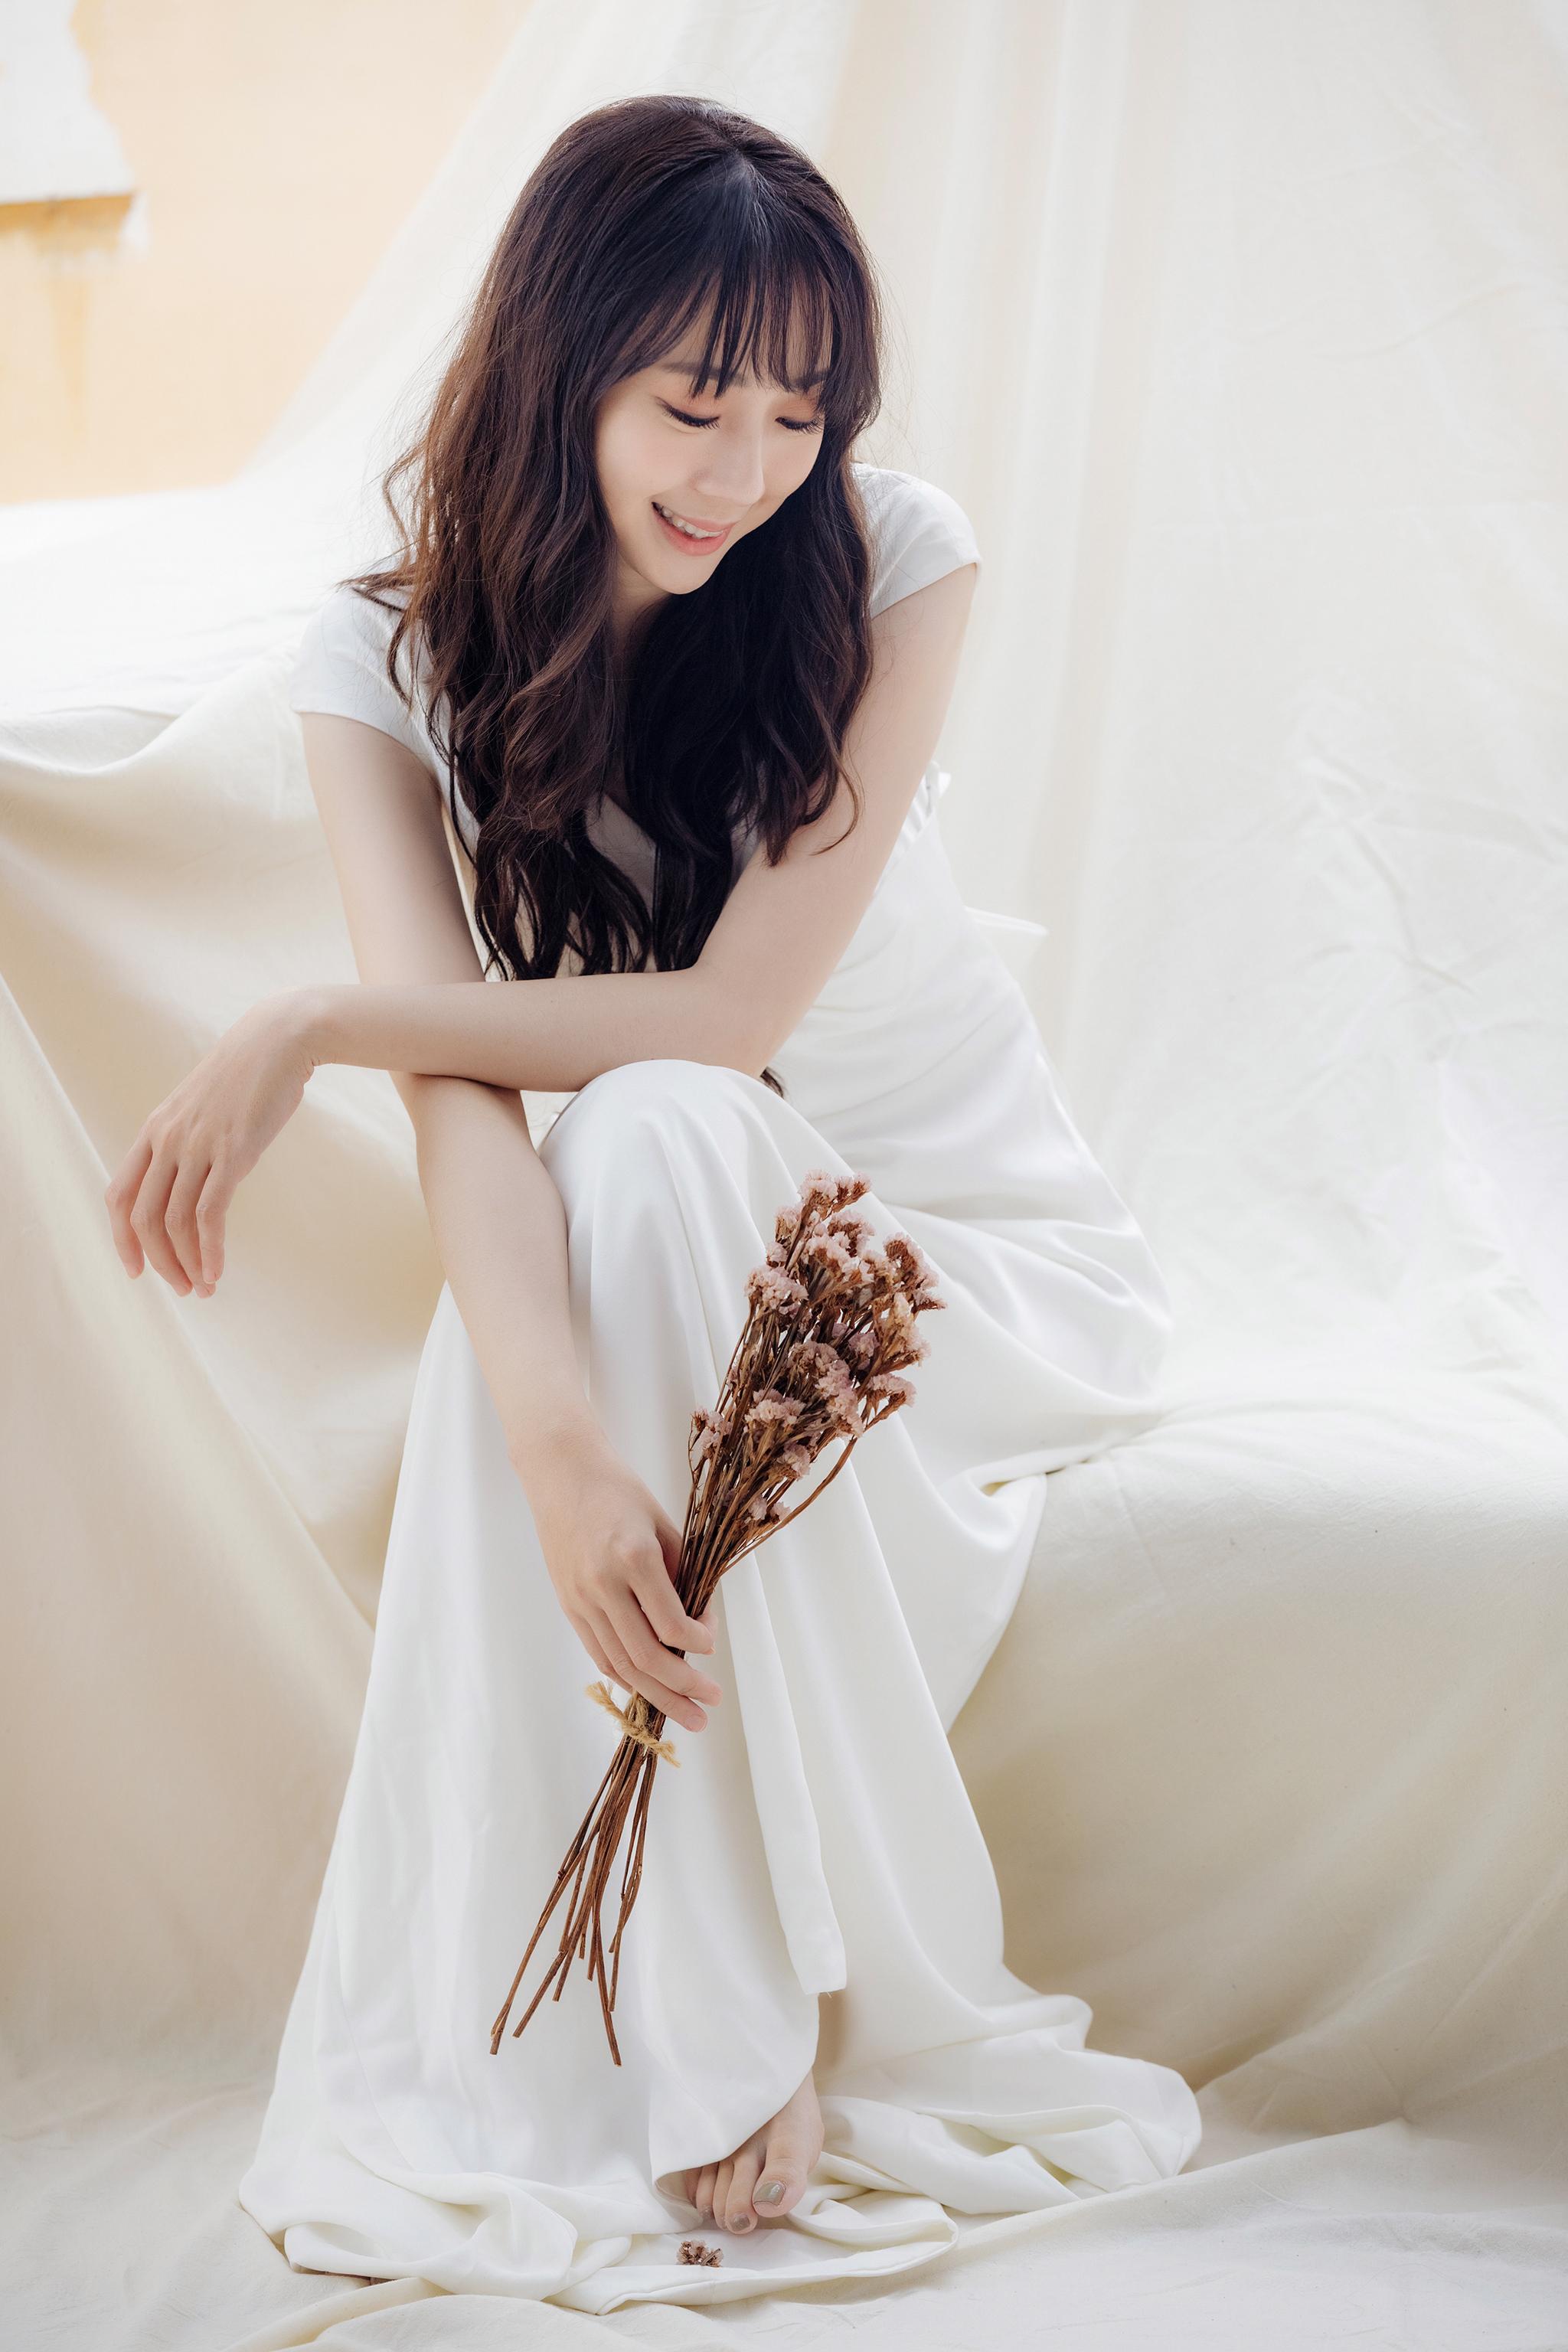 50659285188 d8dc59c408 o - 【自主婚紗】+Melody+